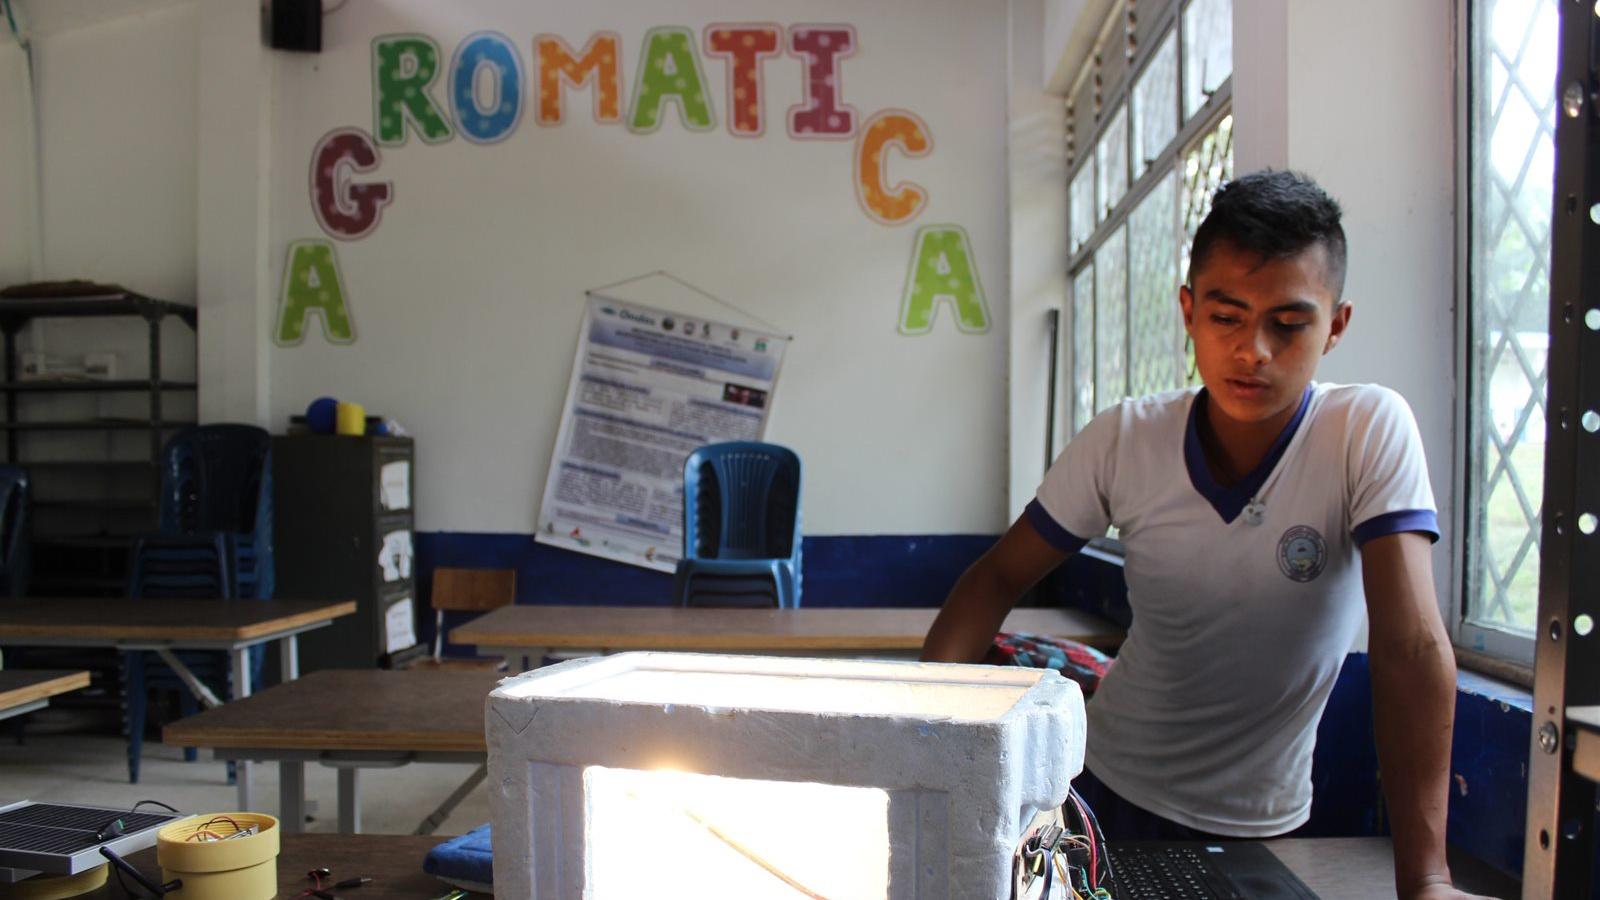 historias/caqueta/agromatica-la-asignatura-escolar-que-pretende-cambiar-el-futuro-del-campo